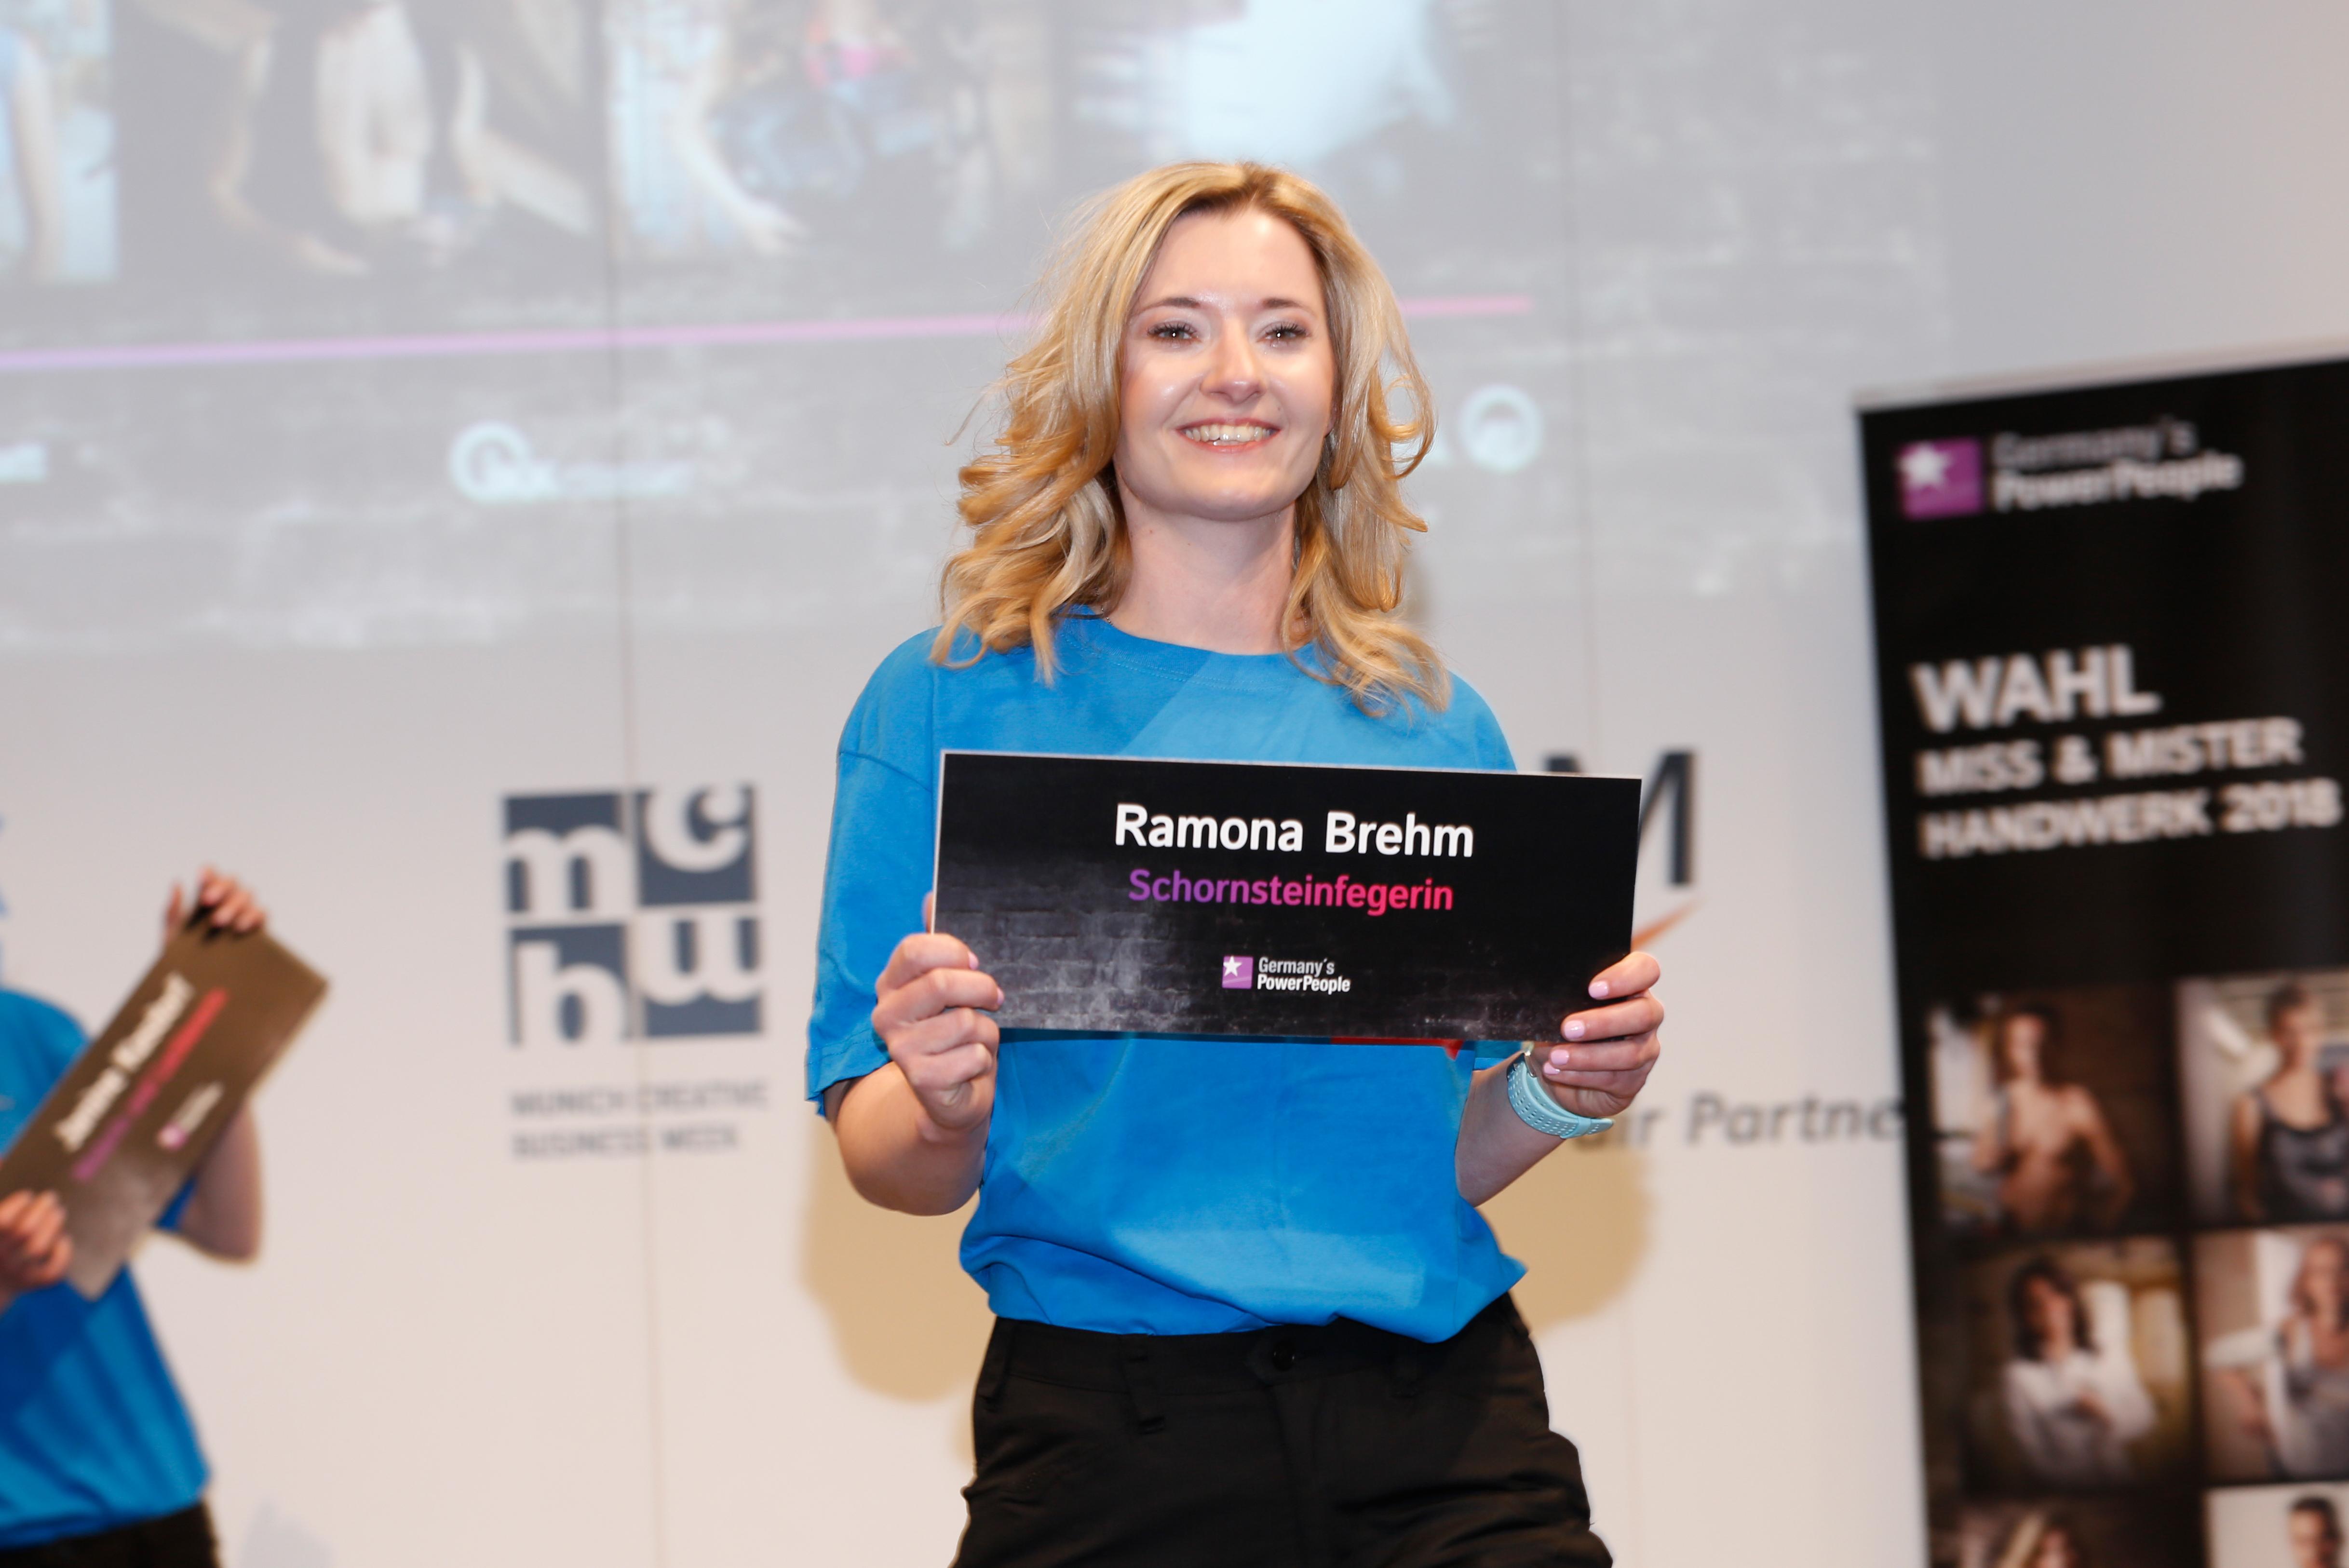 RS6023 Ramona Brehm 3